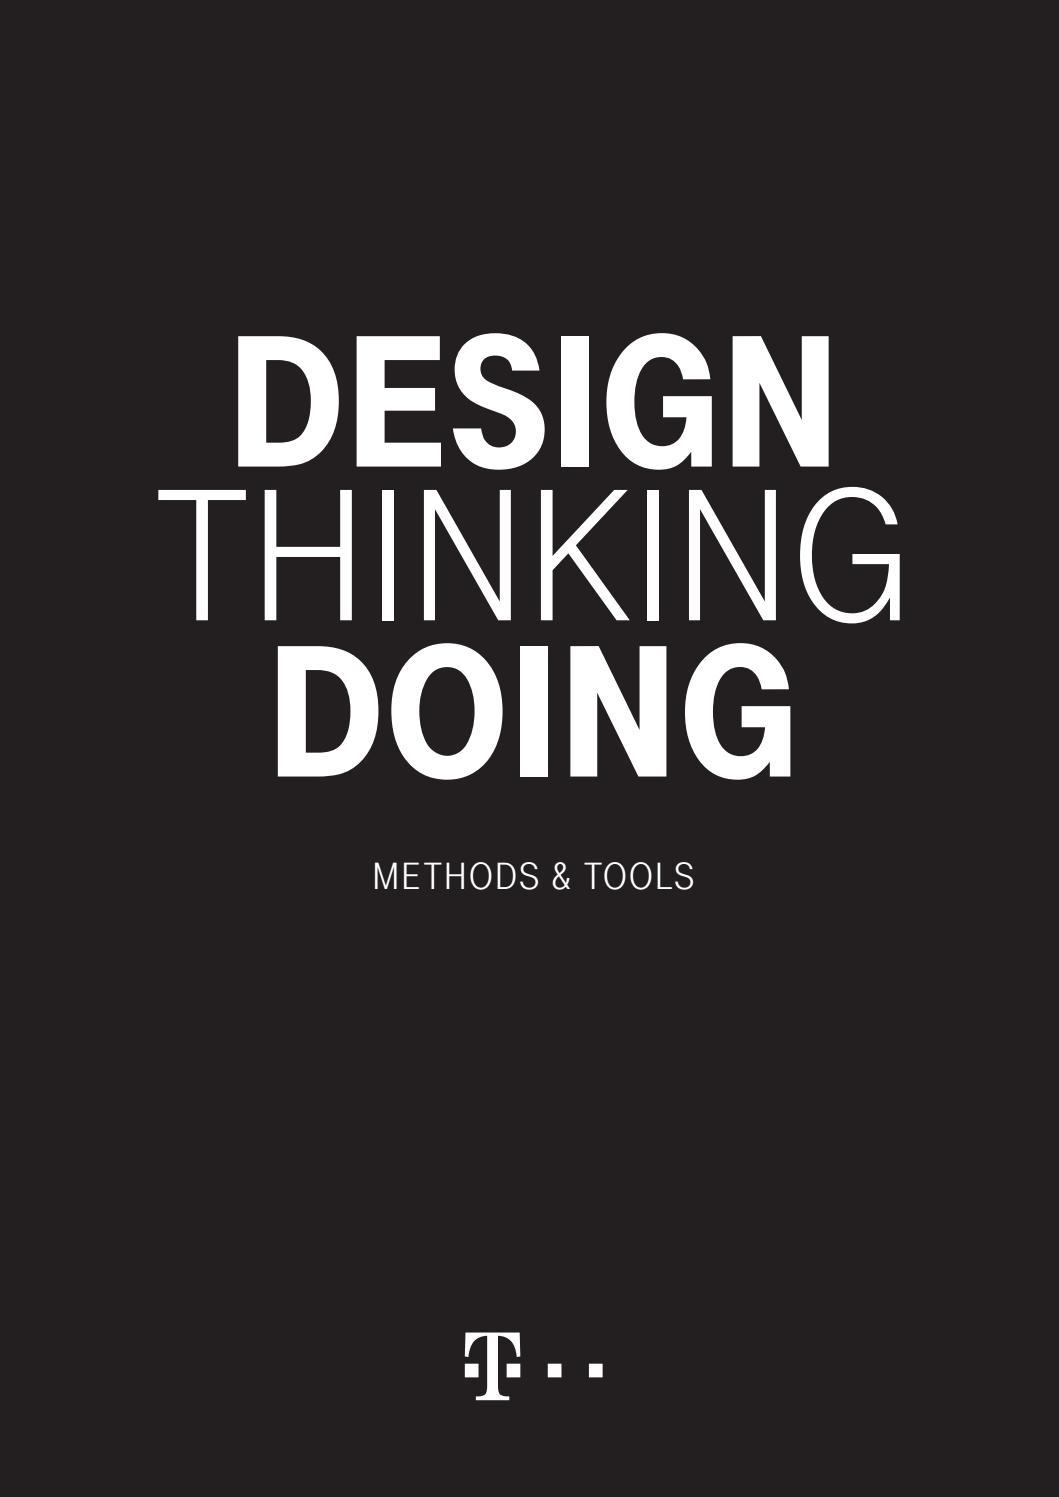 Telekom design design thinking doing